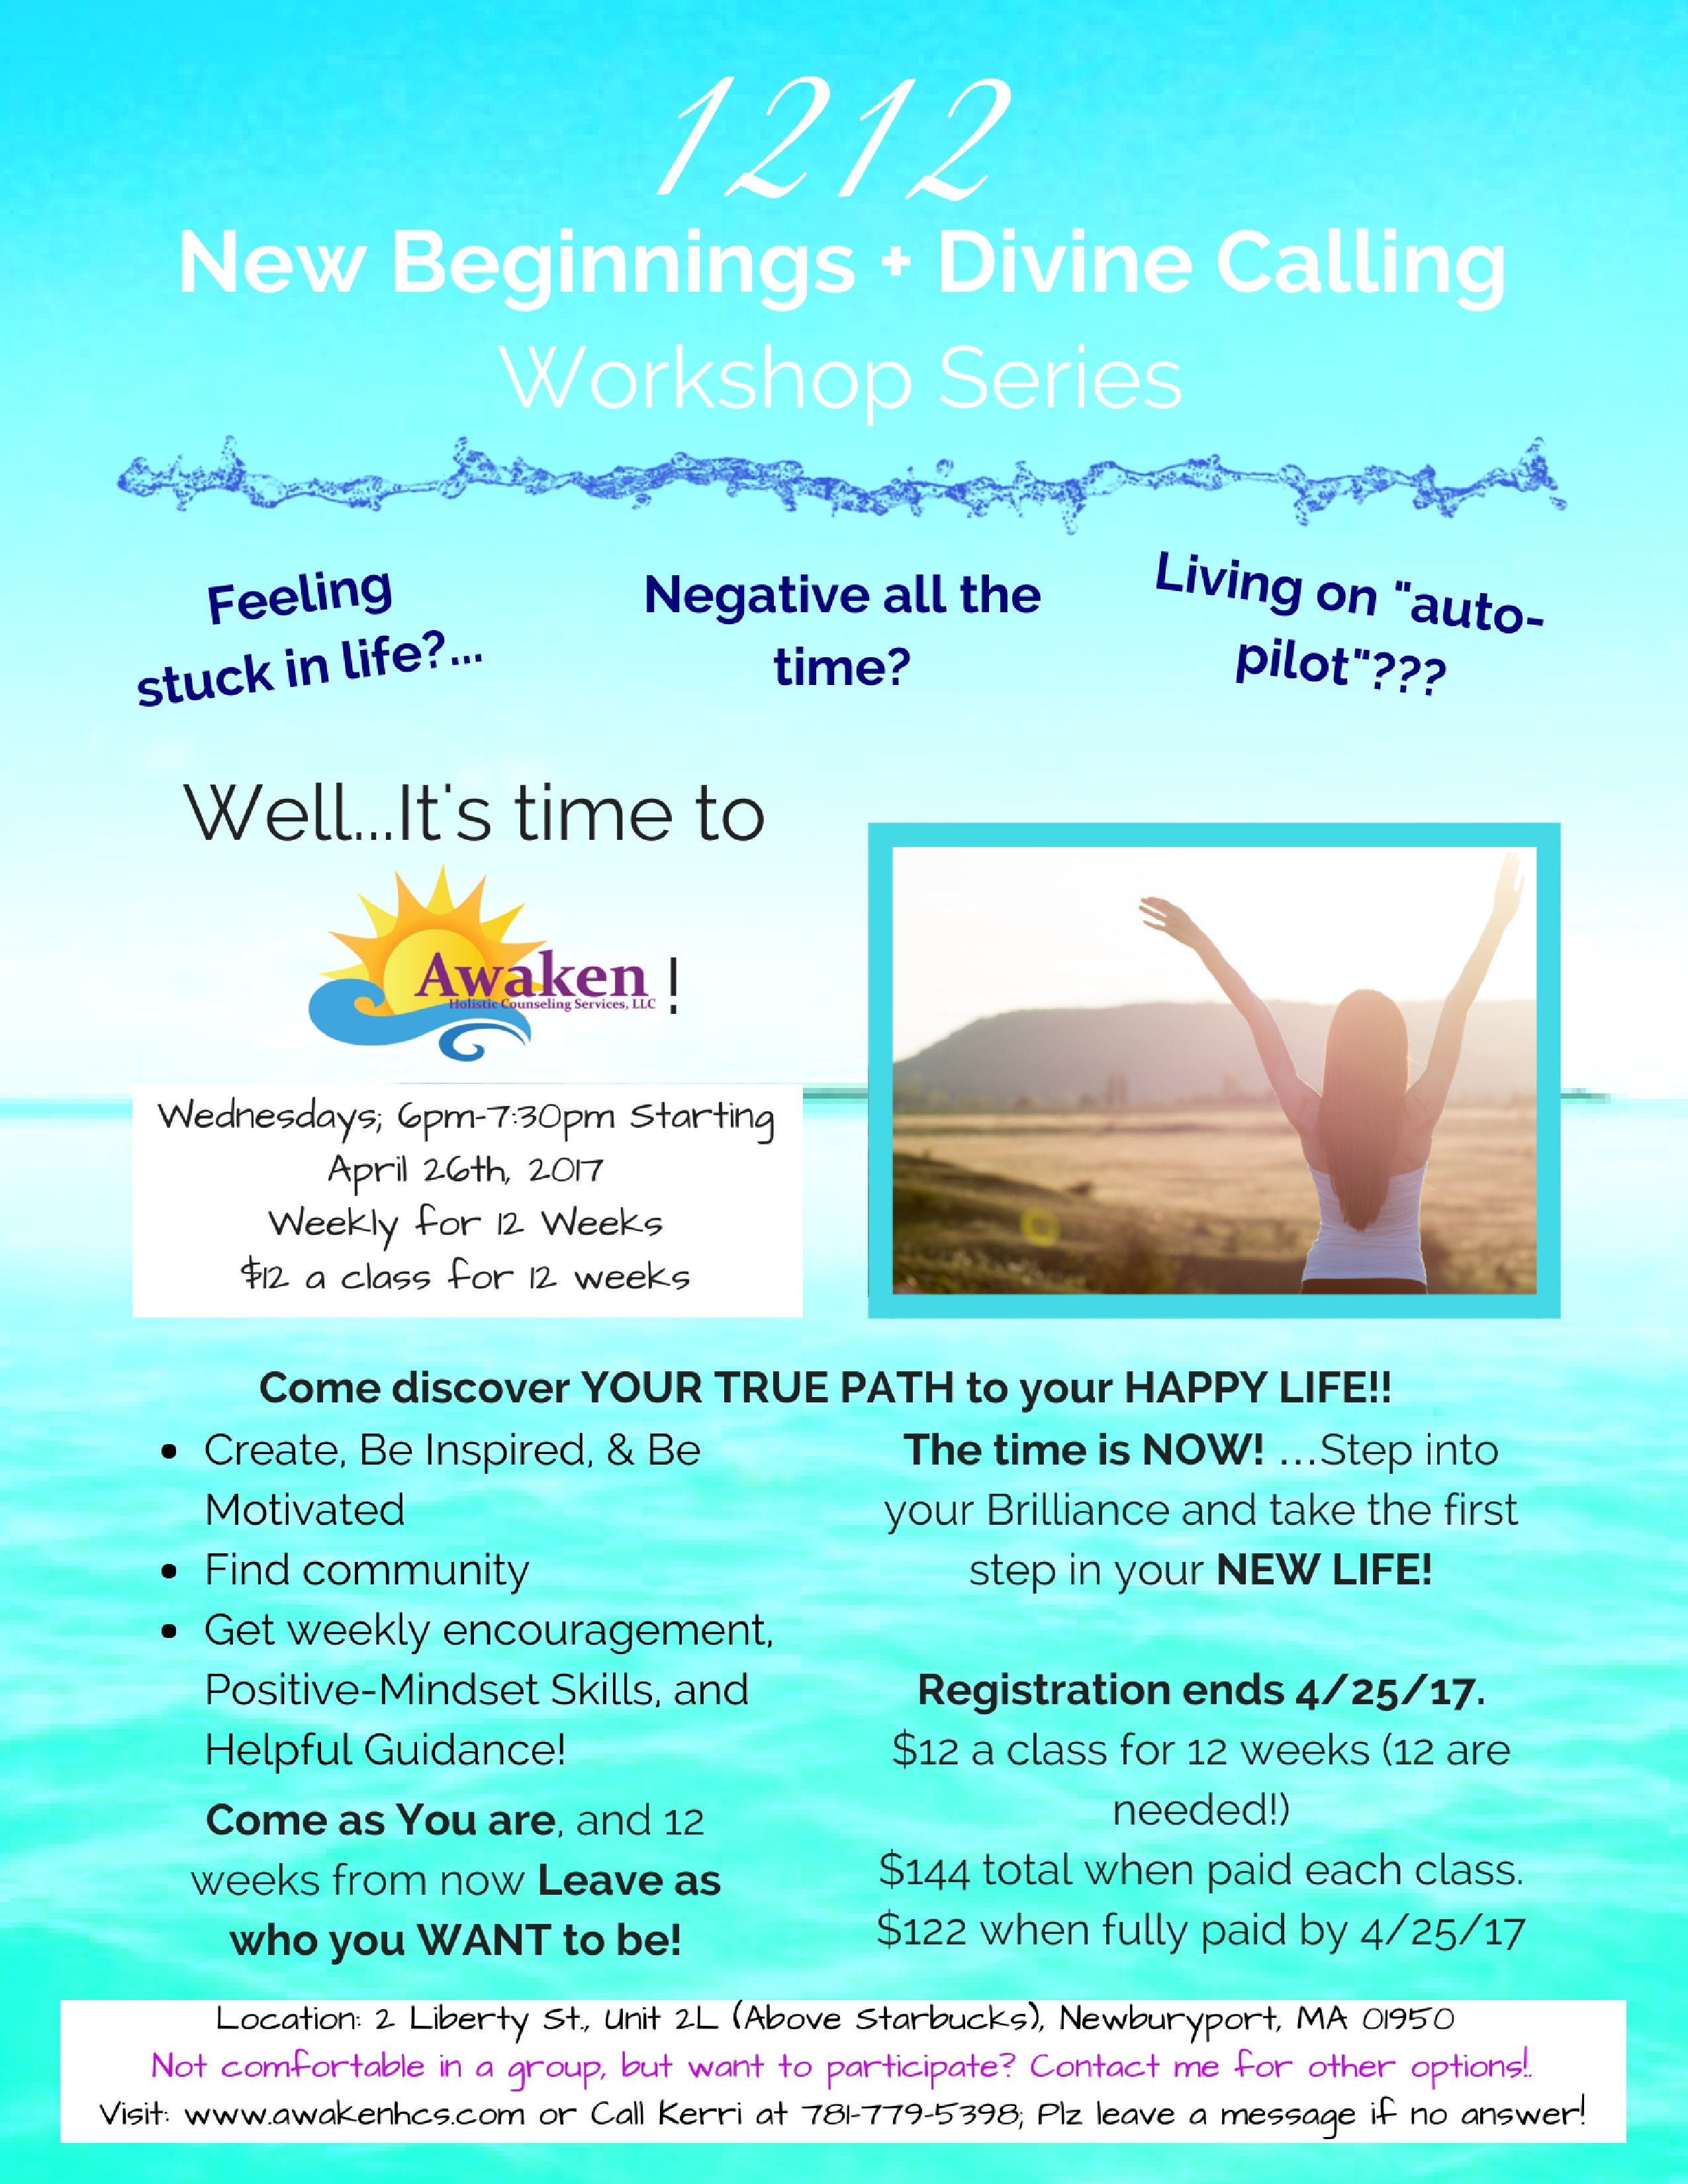 Awaken Holistic Counseling '1212 New Beginnings Workshop'